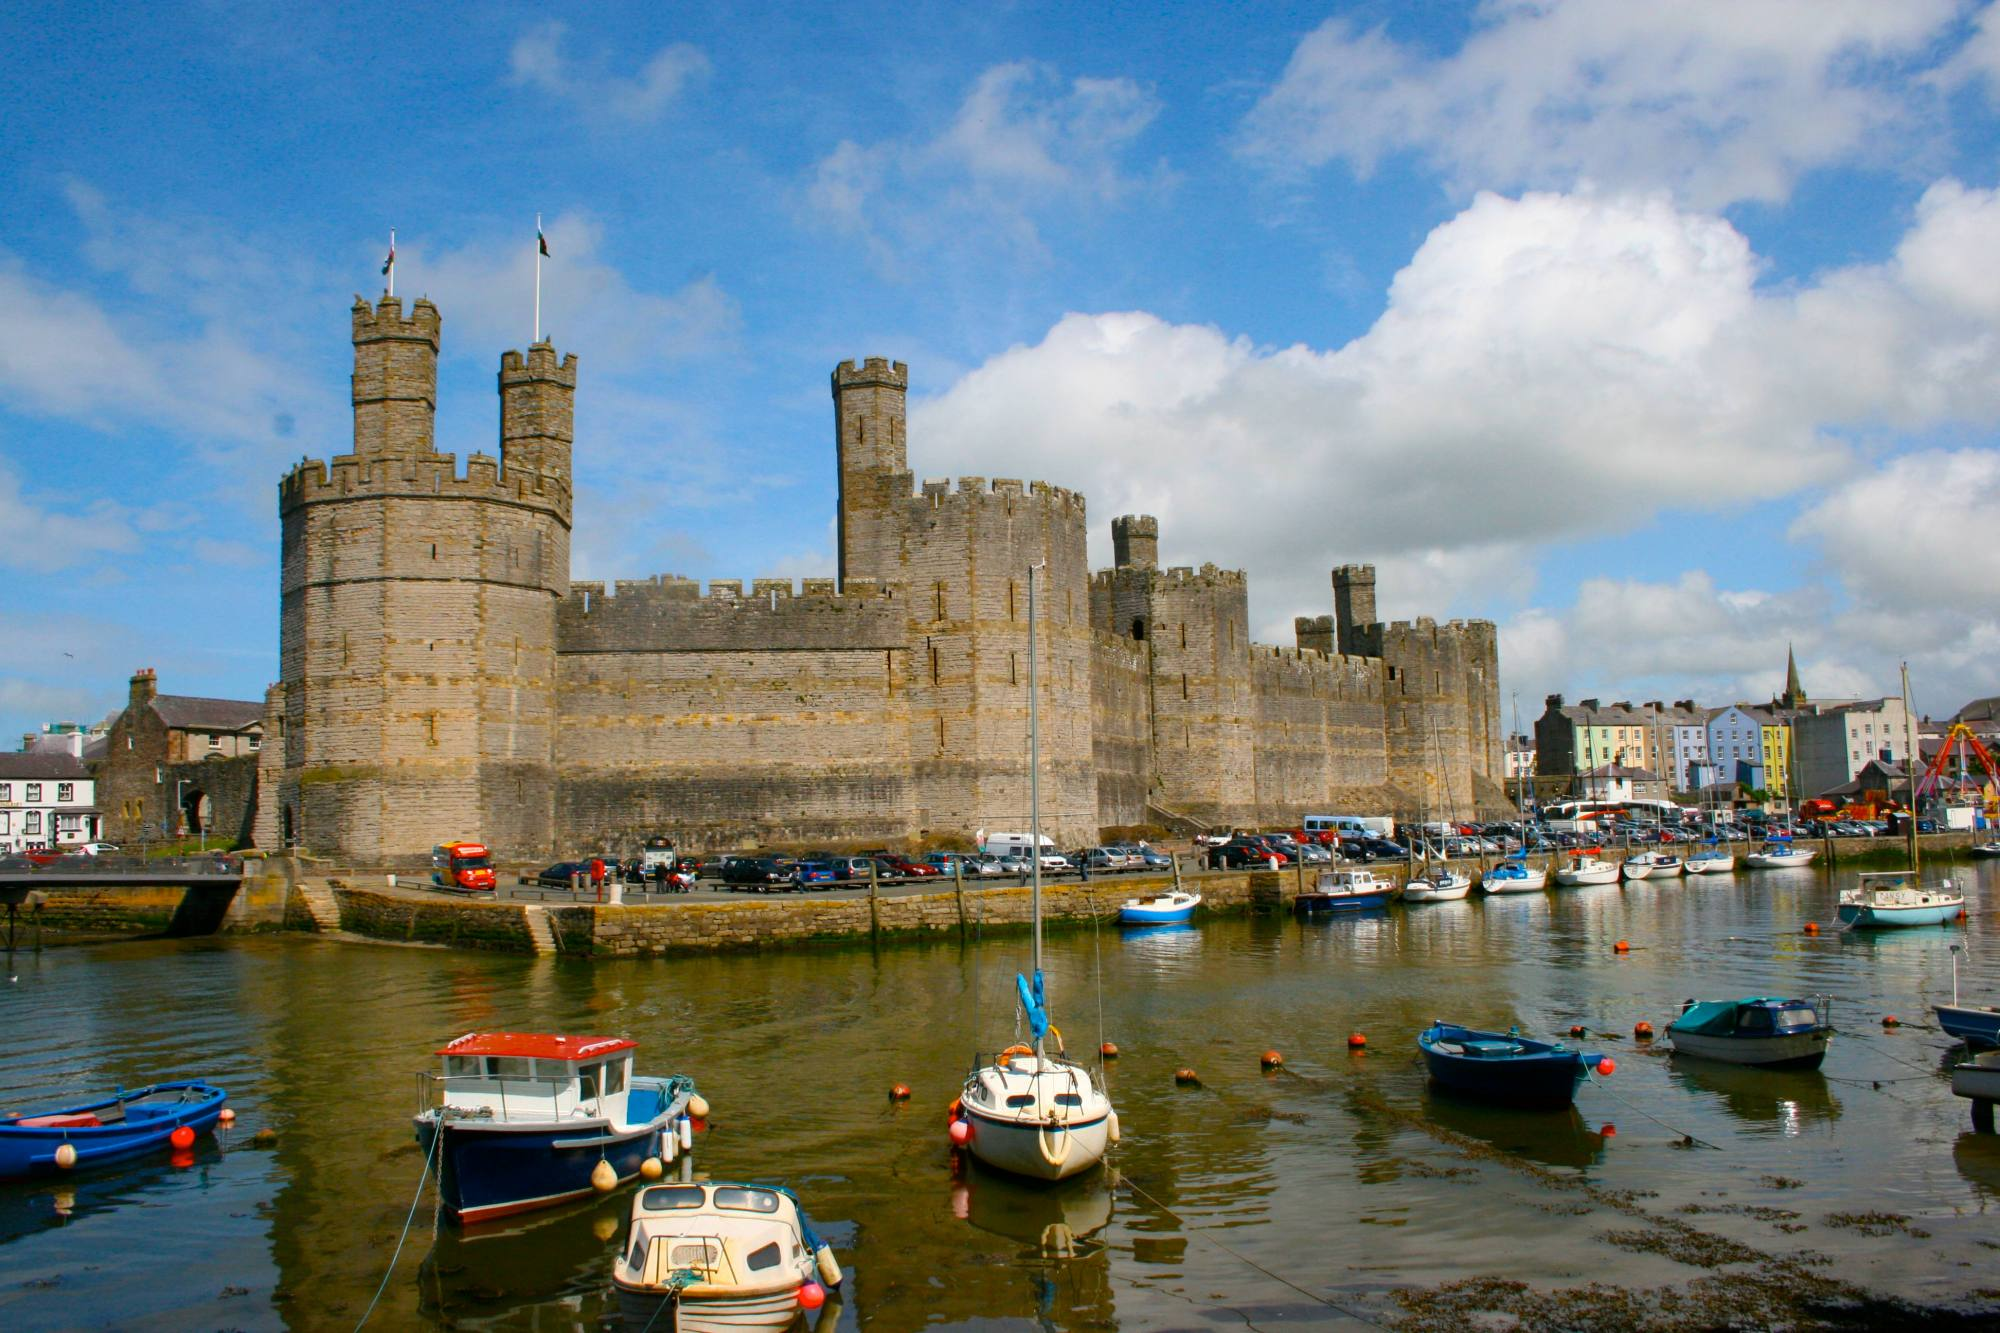 travel photography, Wales photography, castles of wales, Caernarfon Castle, travel photos